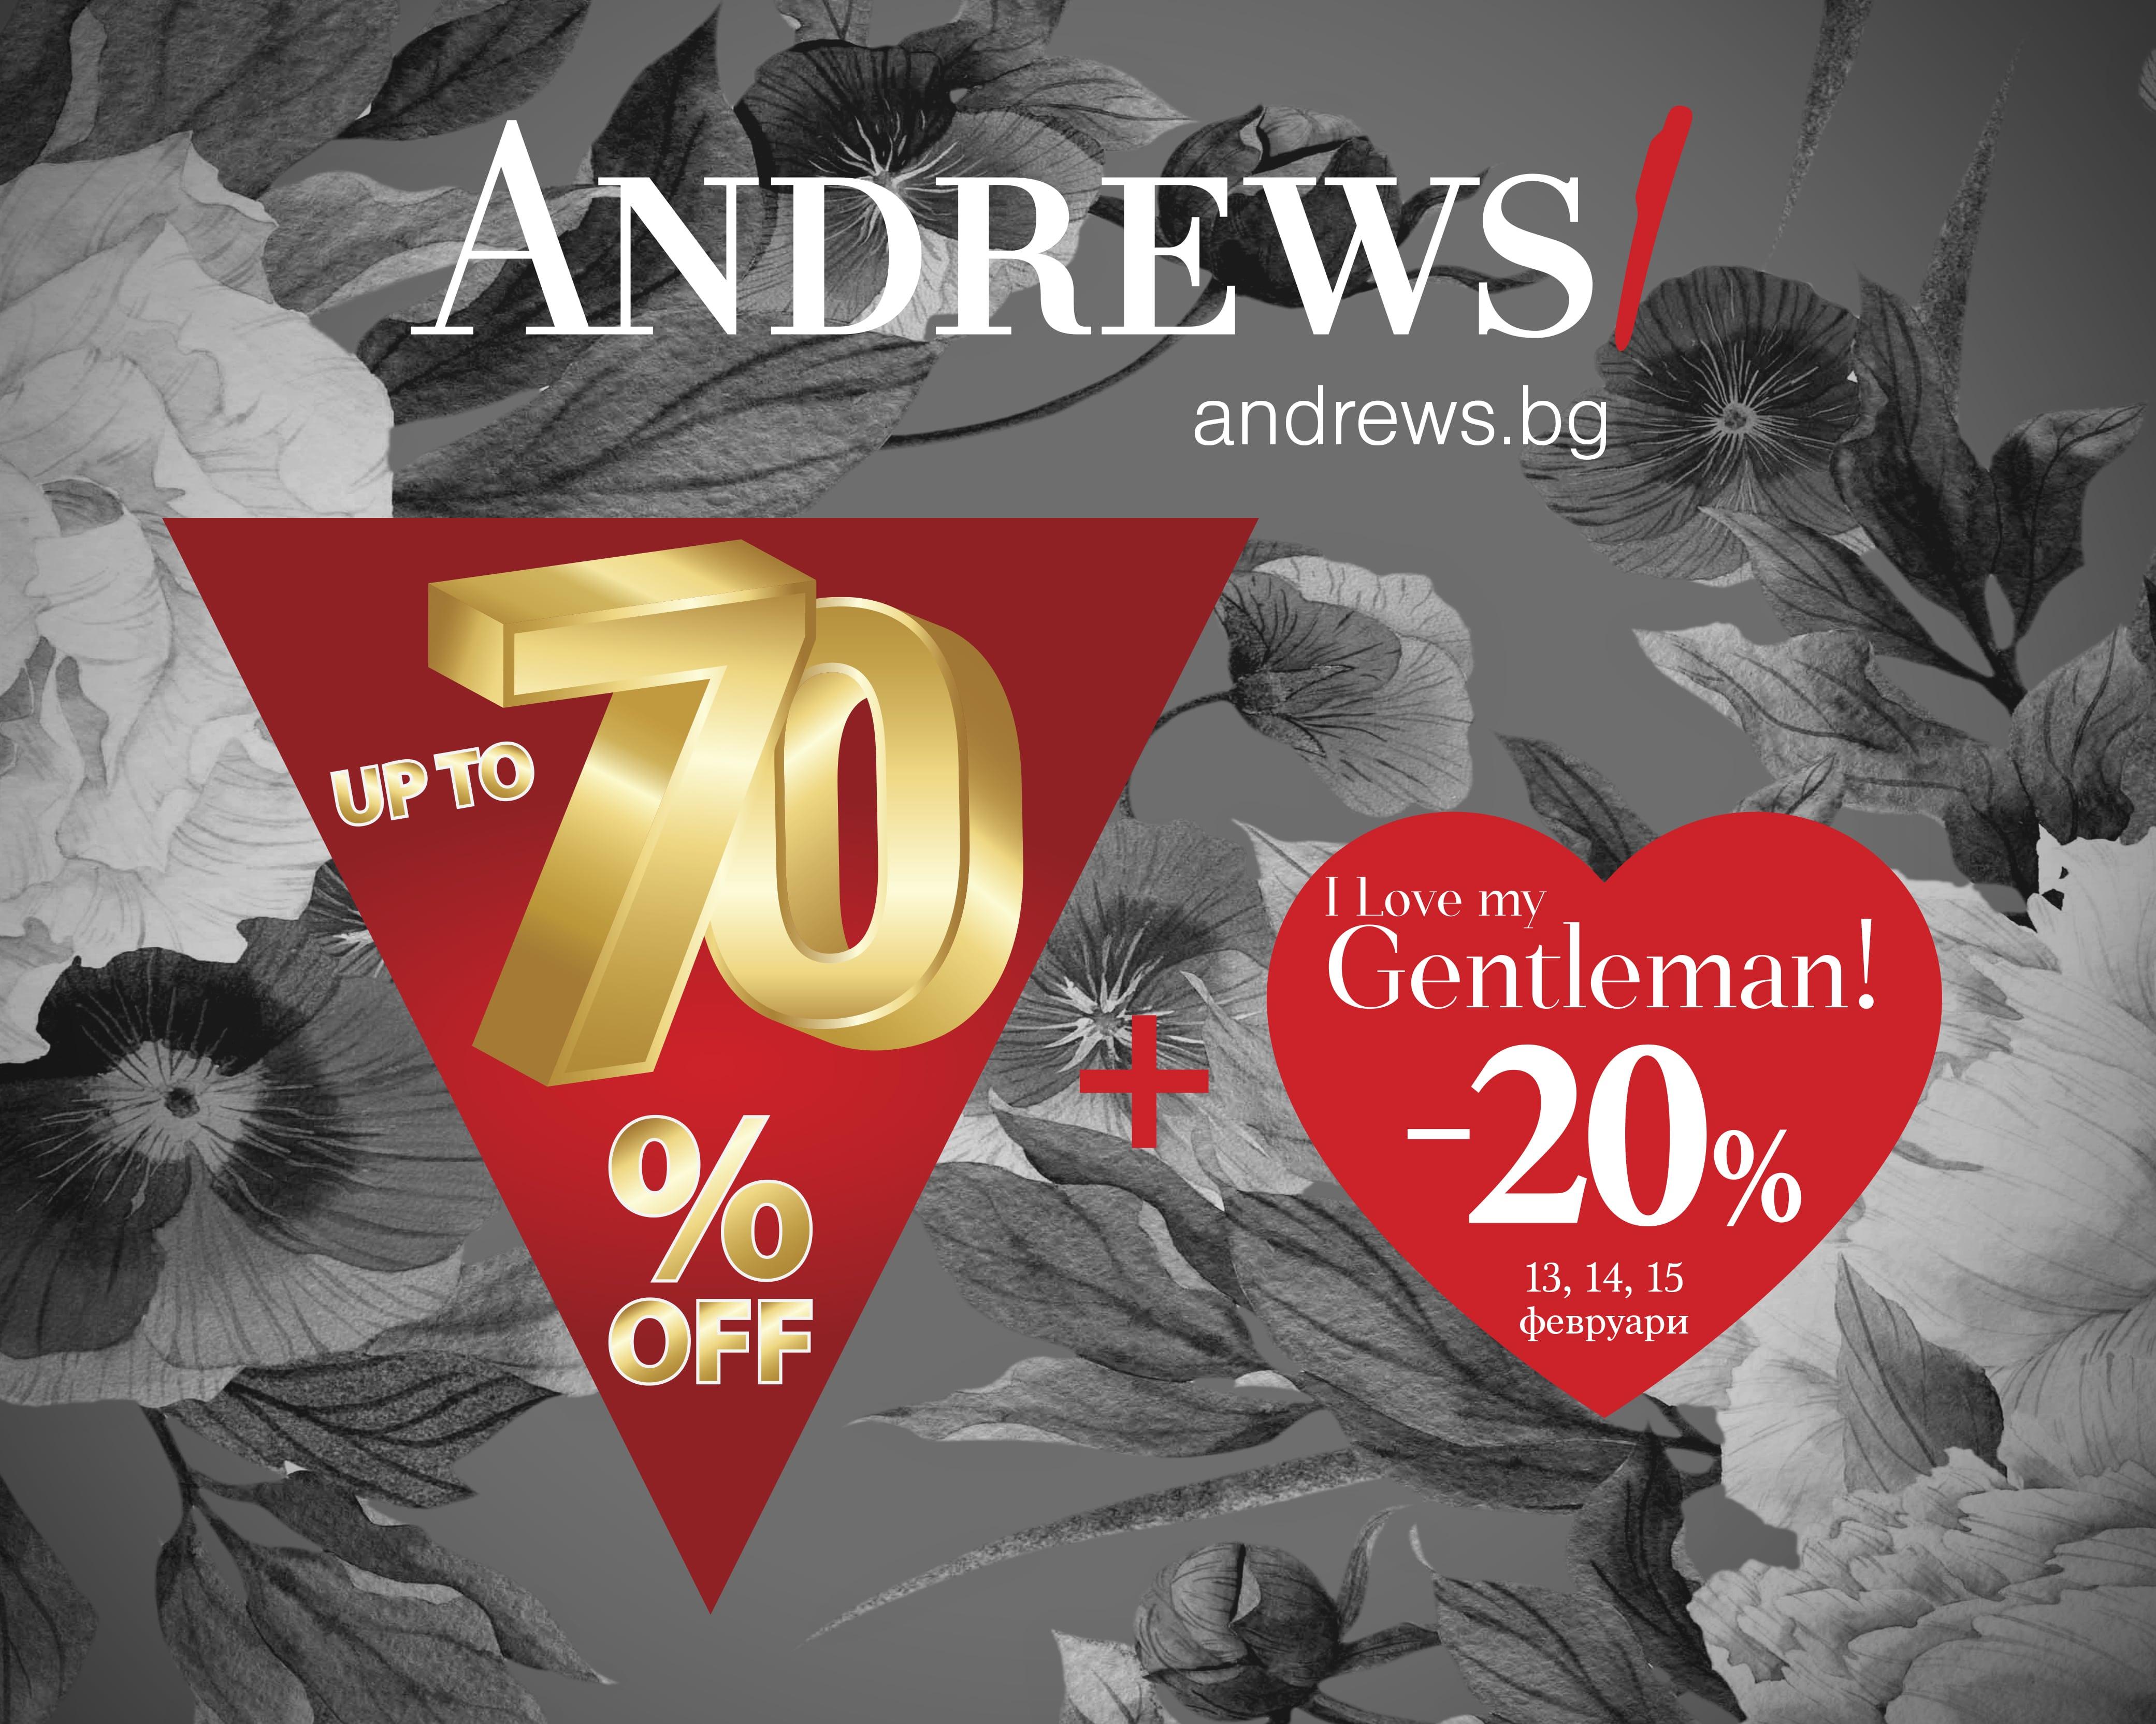 70%+20% discount at Andrews/